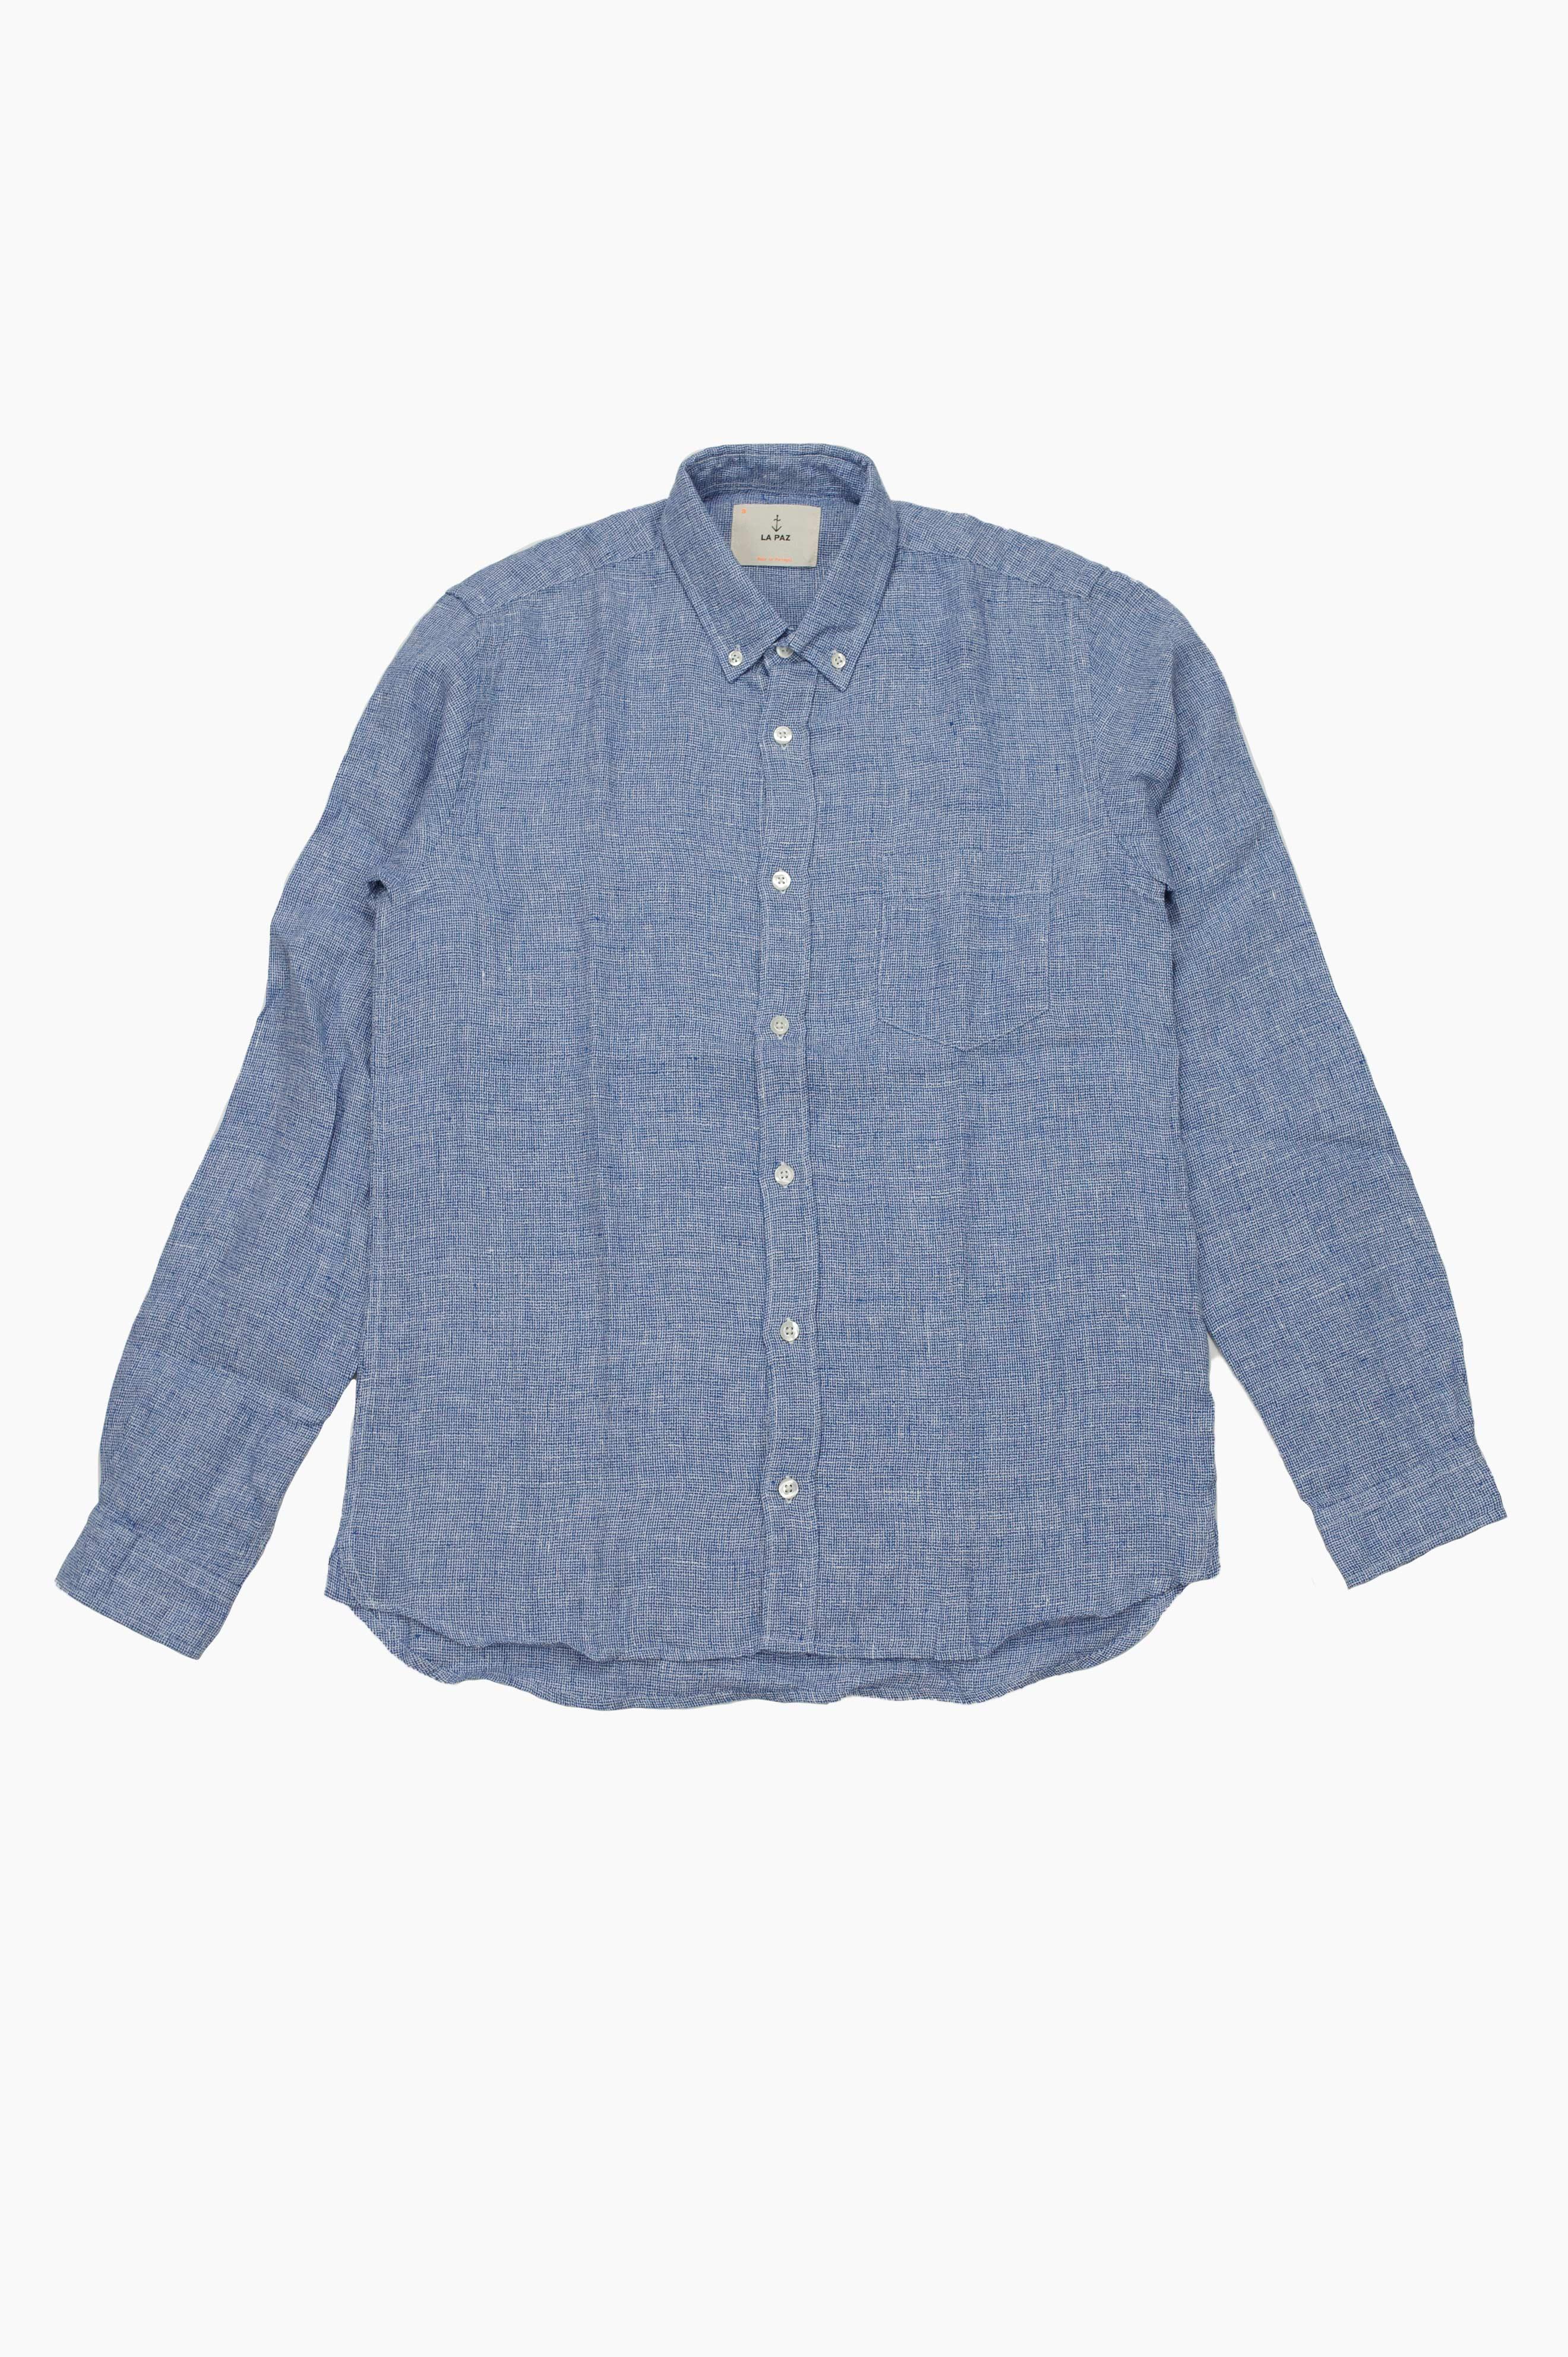 Branco Linen Shirt Blue Micro Squares